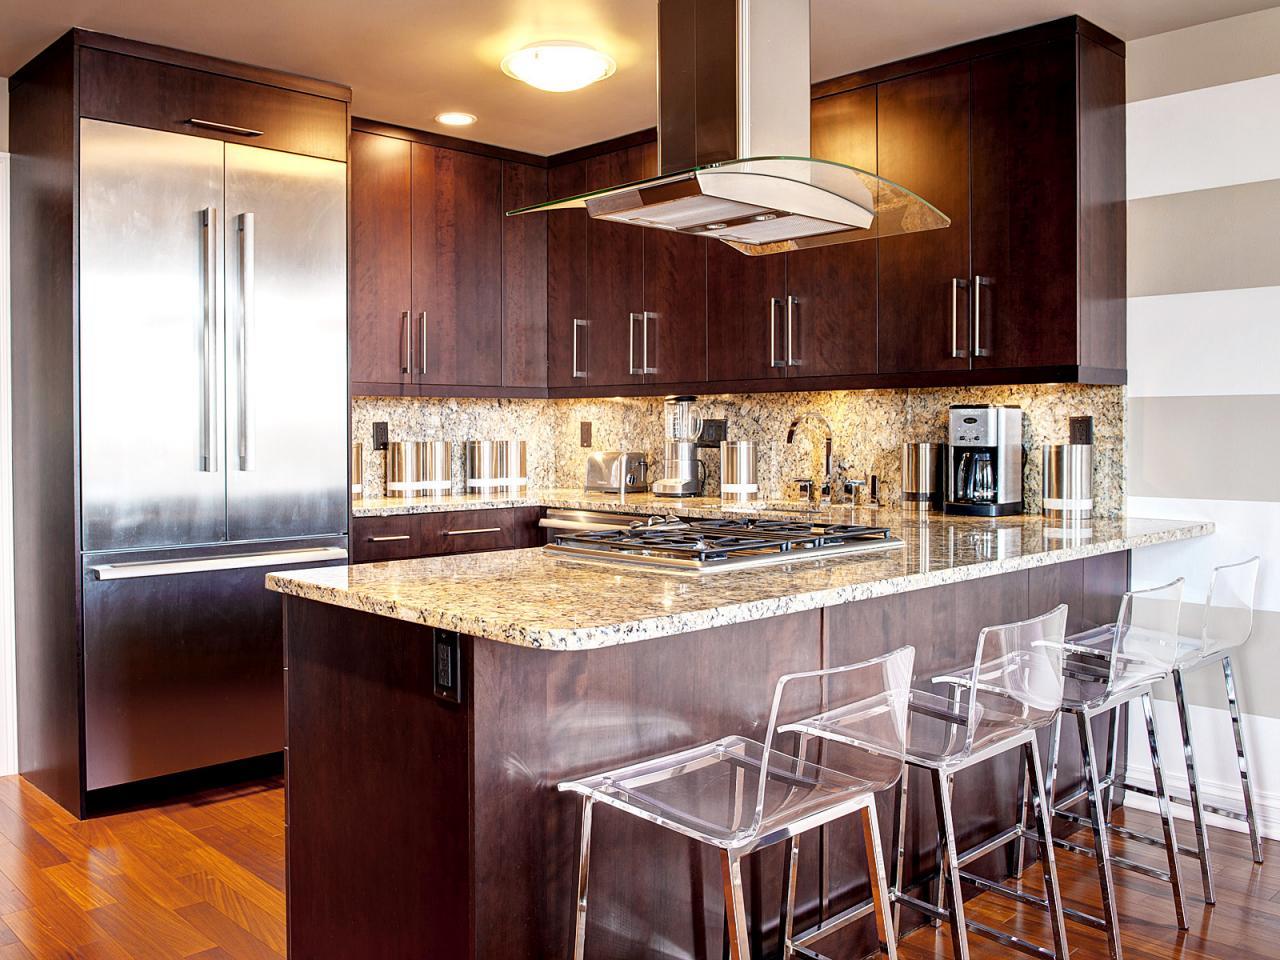 kitchen design ideas for small kitchens island photo - 10